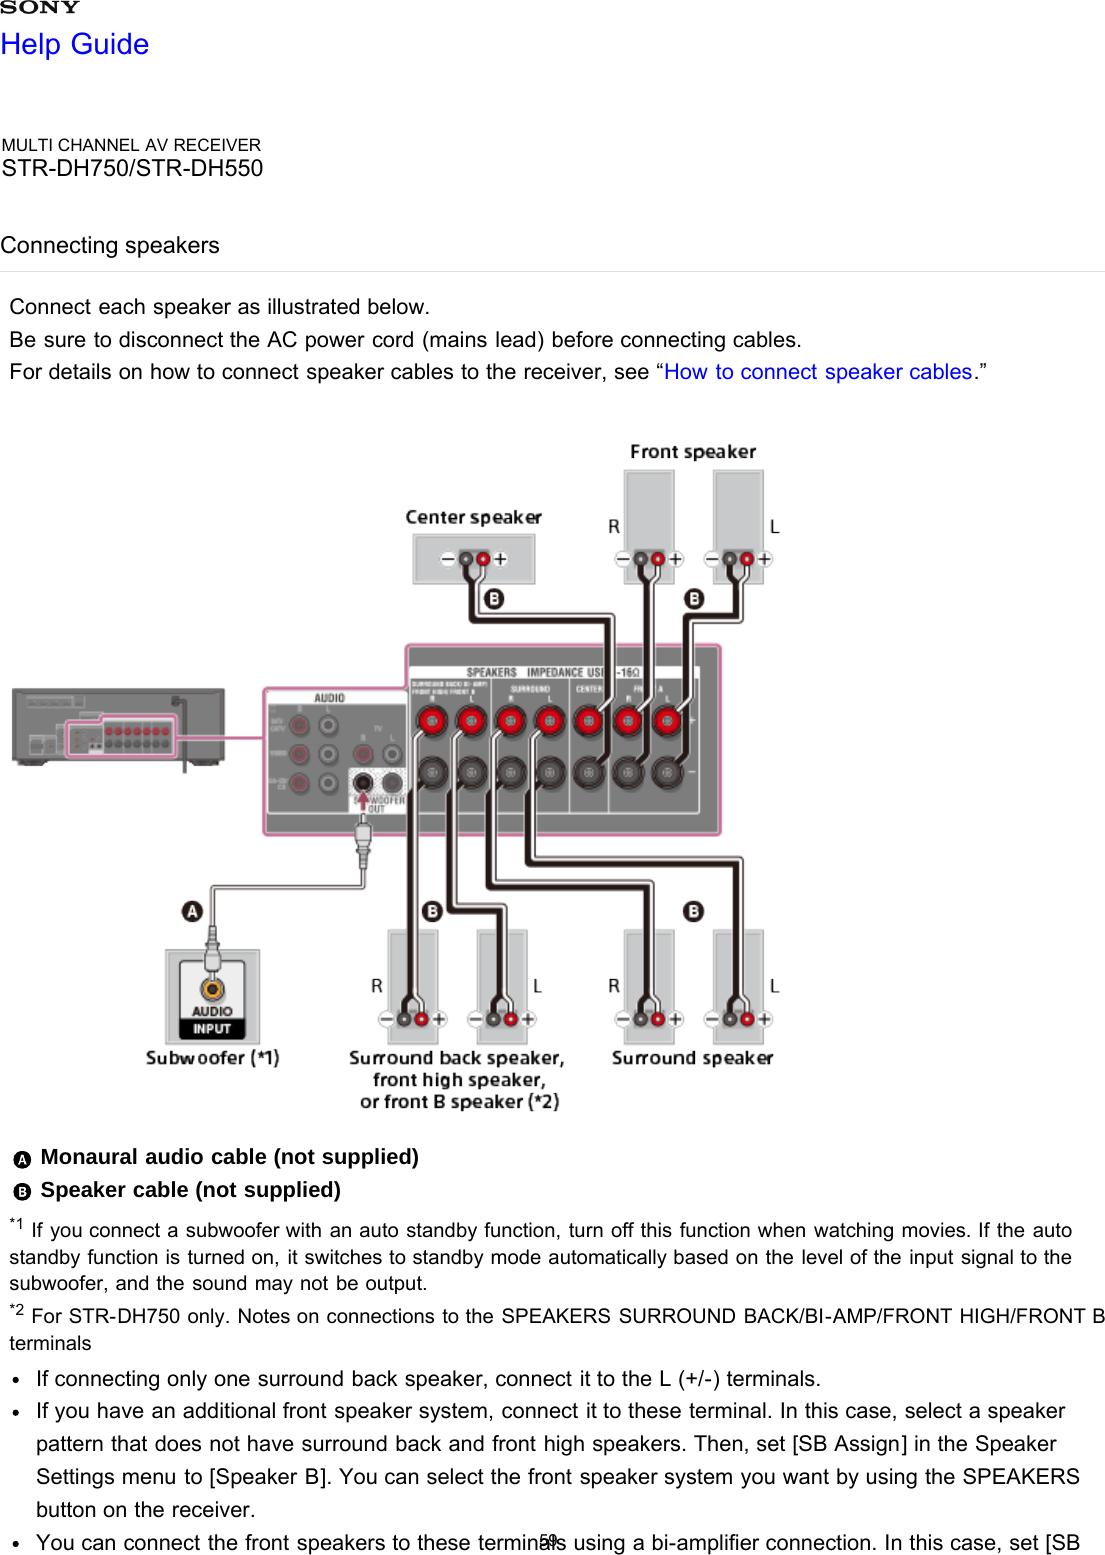 Sony STR DH750 Help Guide | Top User Manual (Printable PDF) DH550 En